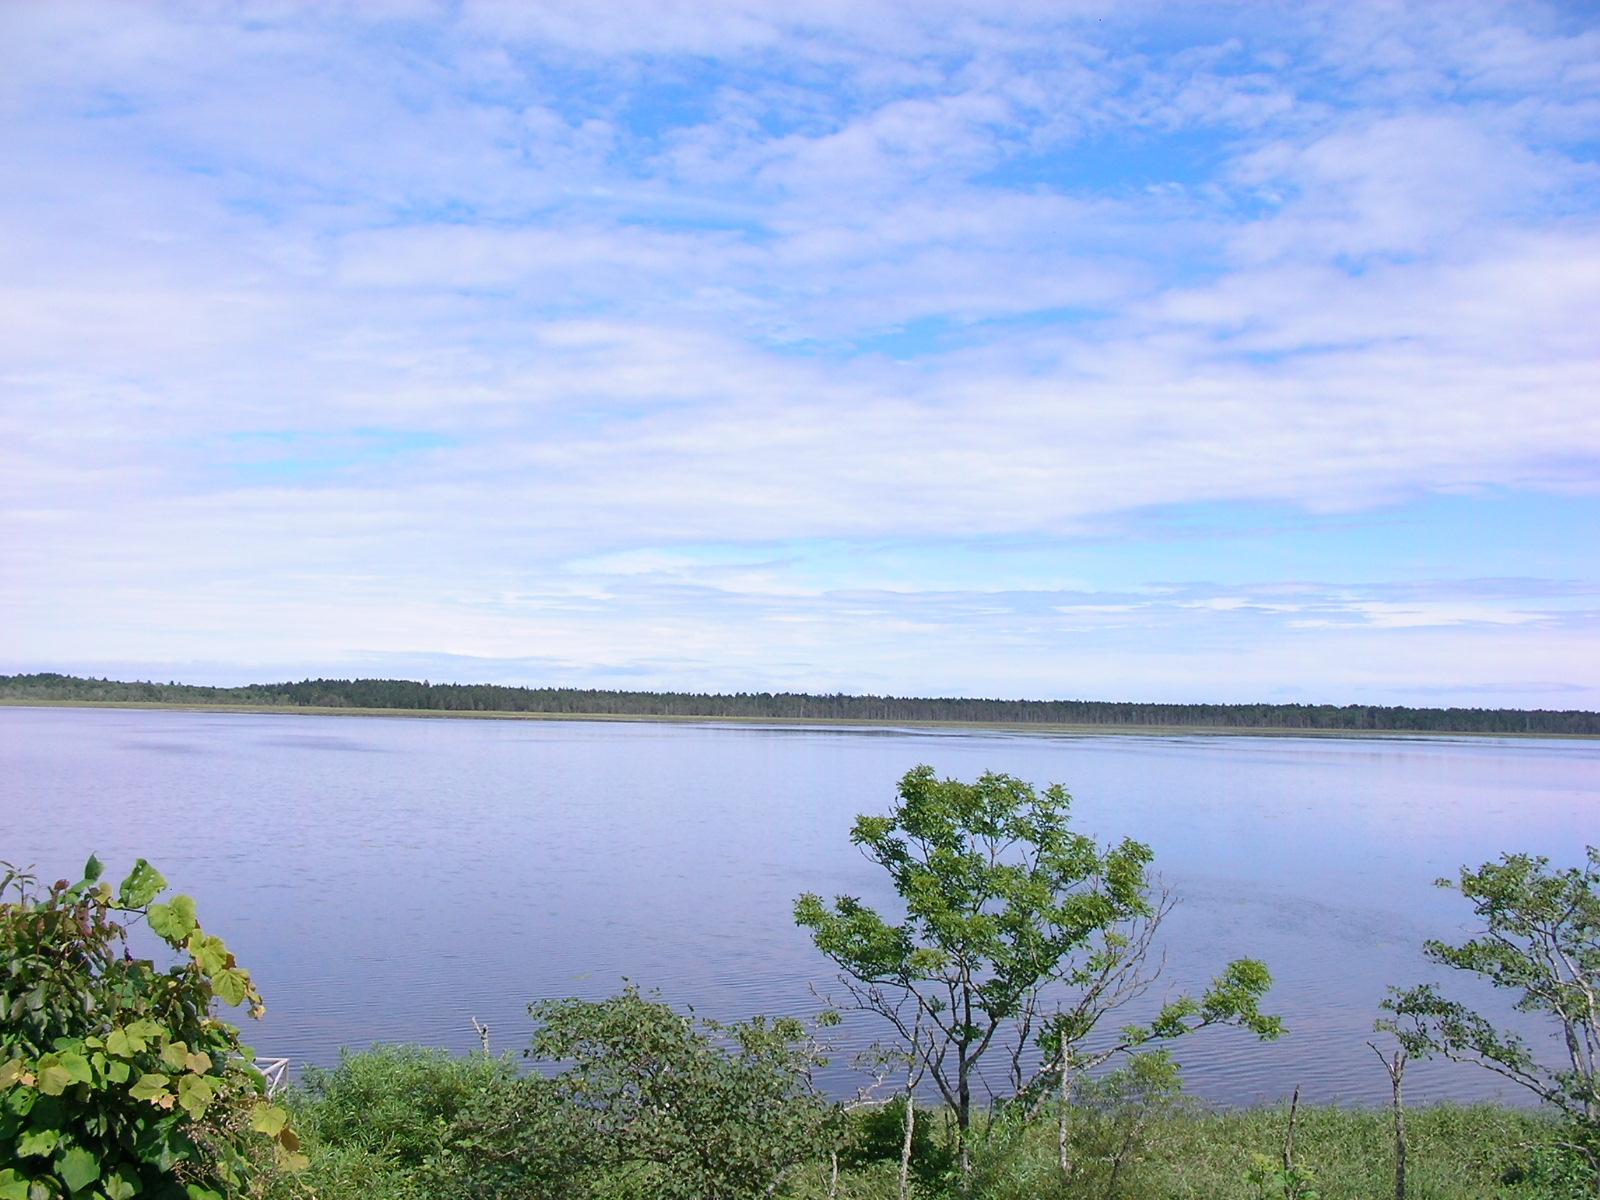 Lake Furen and Shunkunitai Sandbank